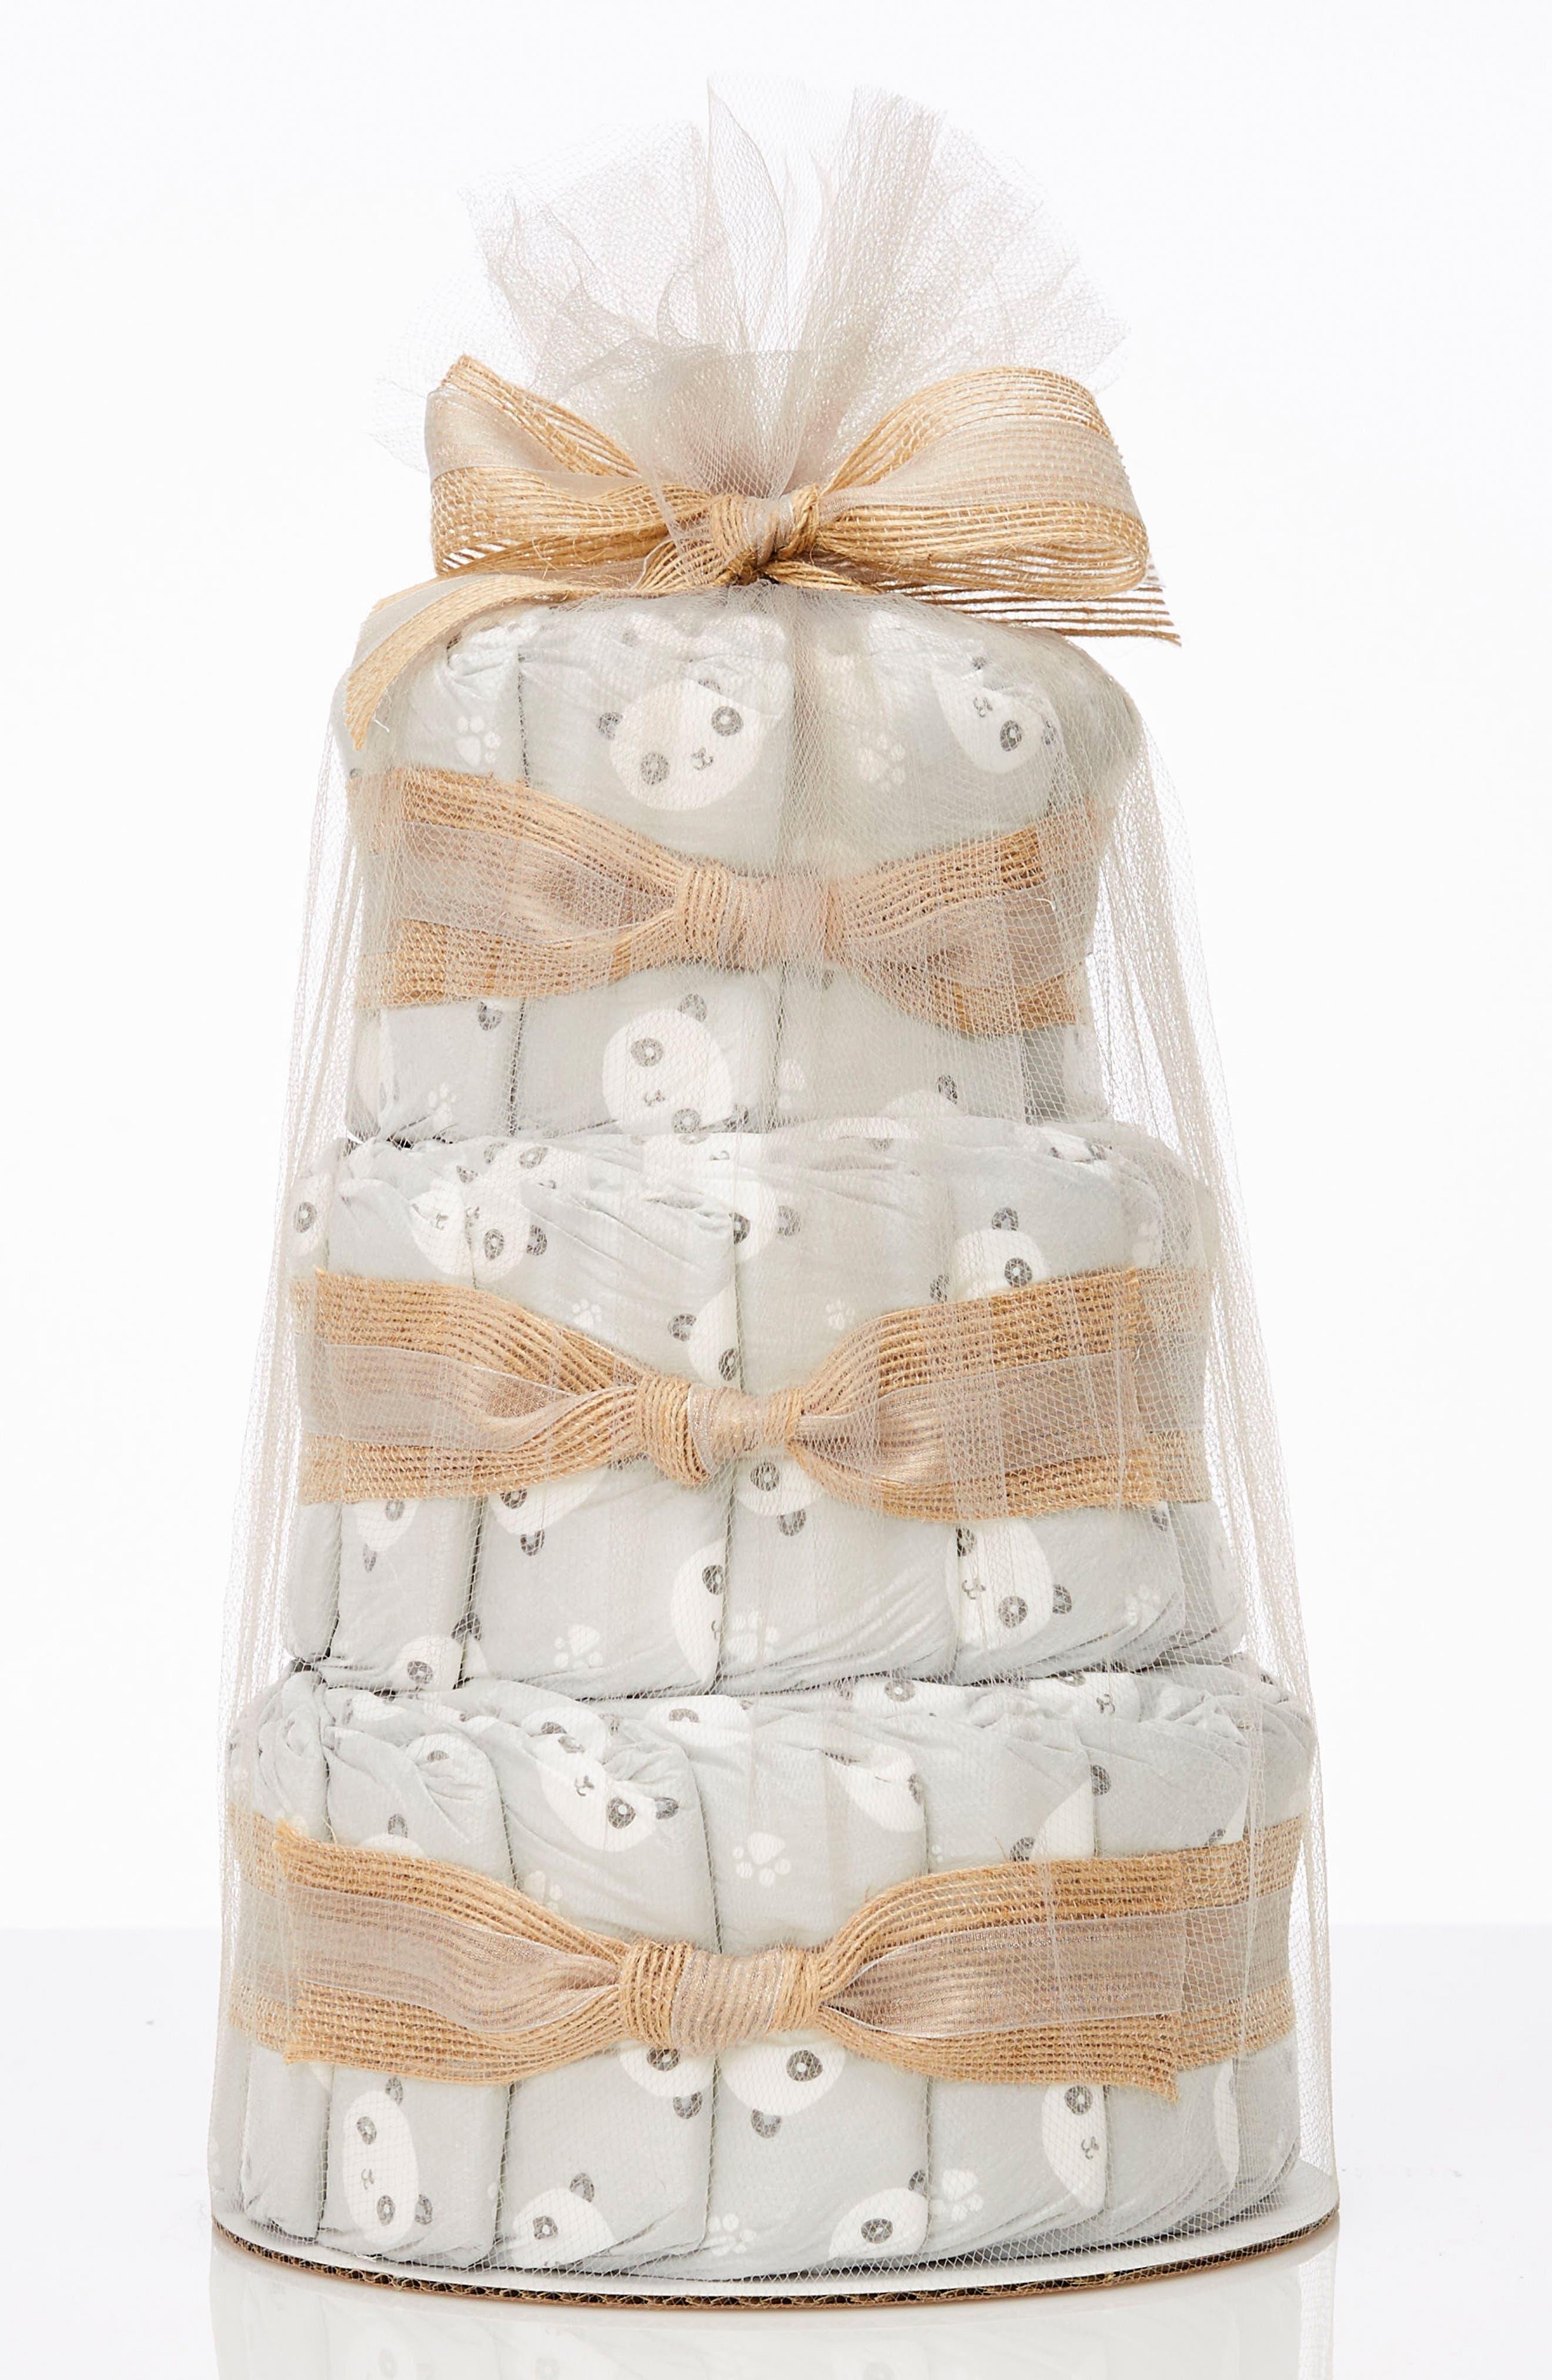 Mini Diaper Cake & Travel-Size Essentials Set,                             Main thumbnail 2, color,